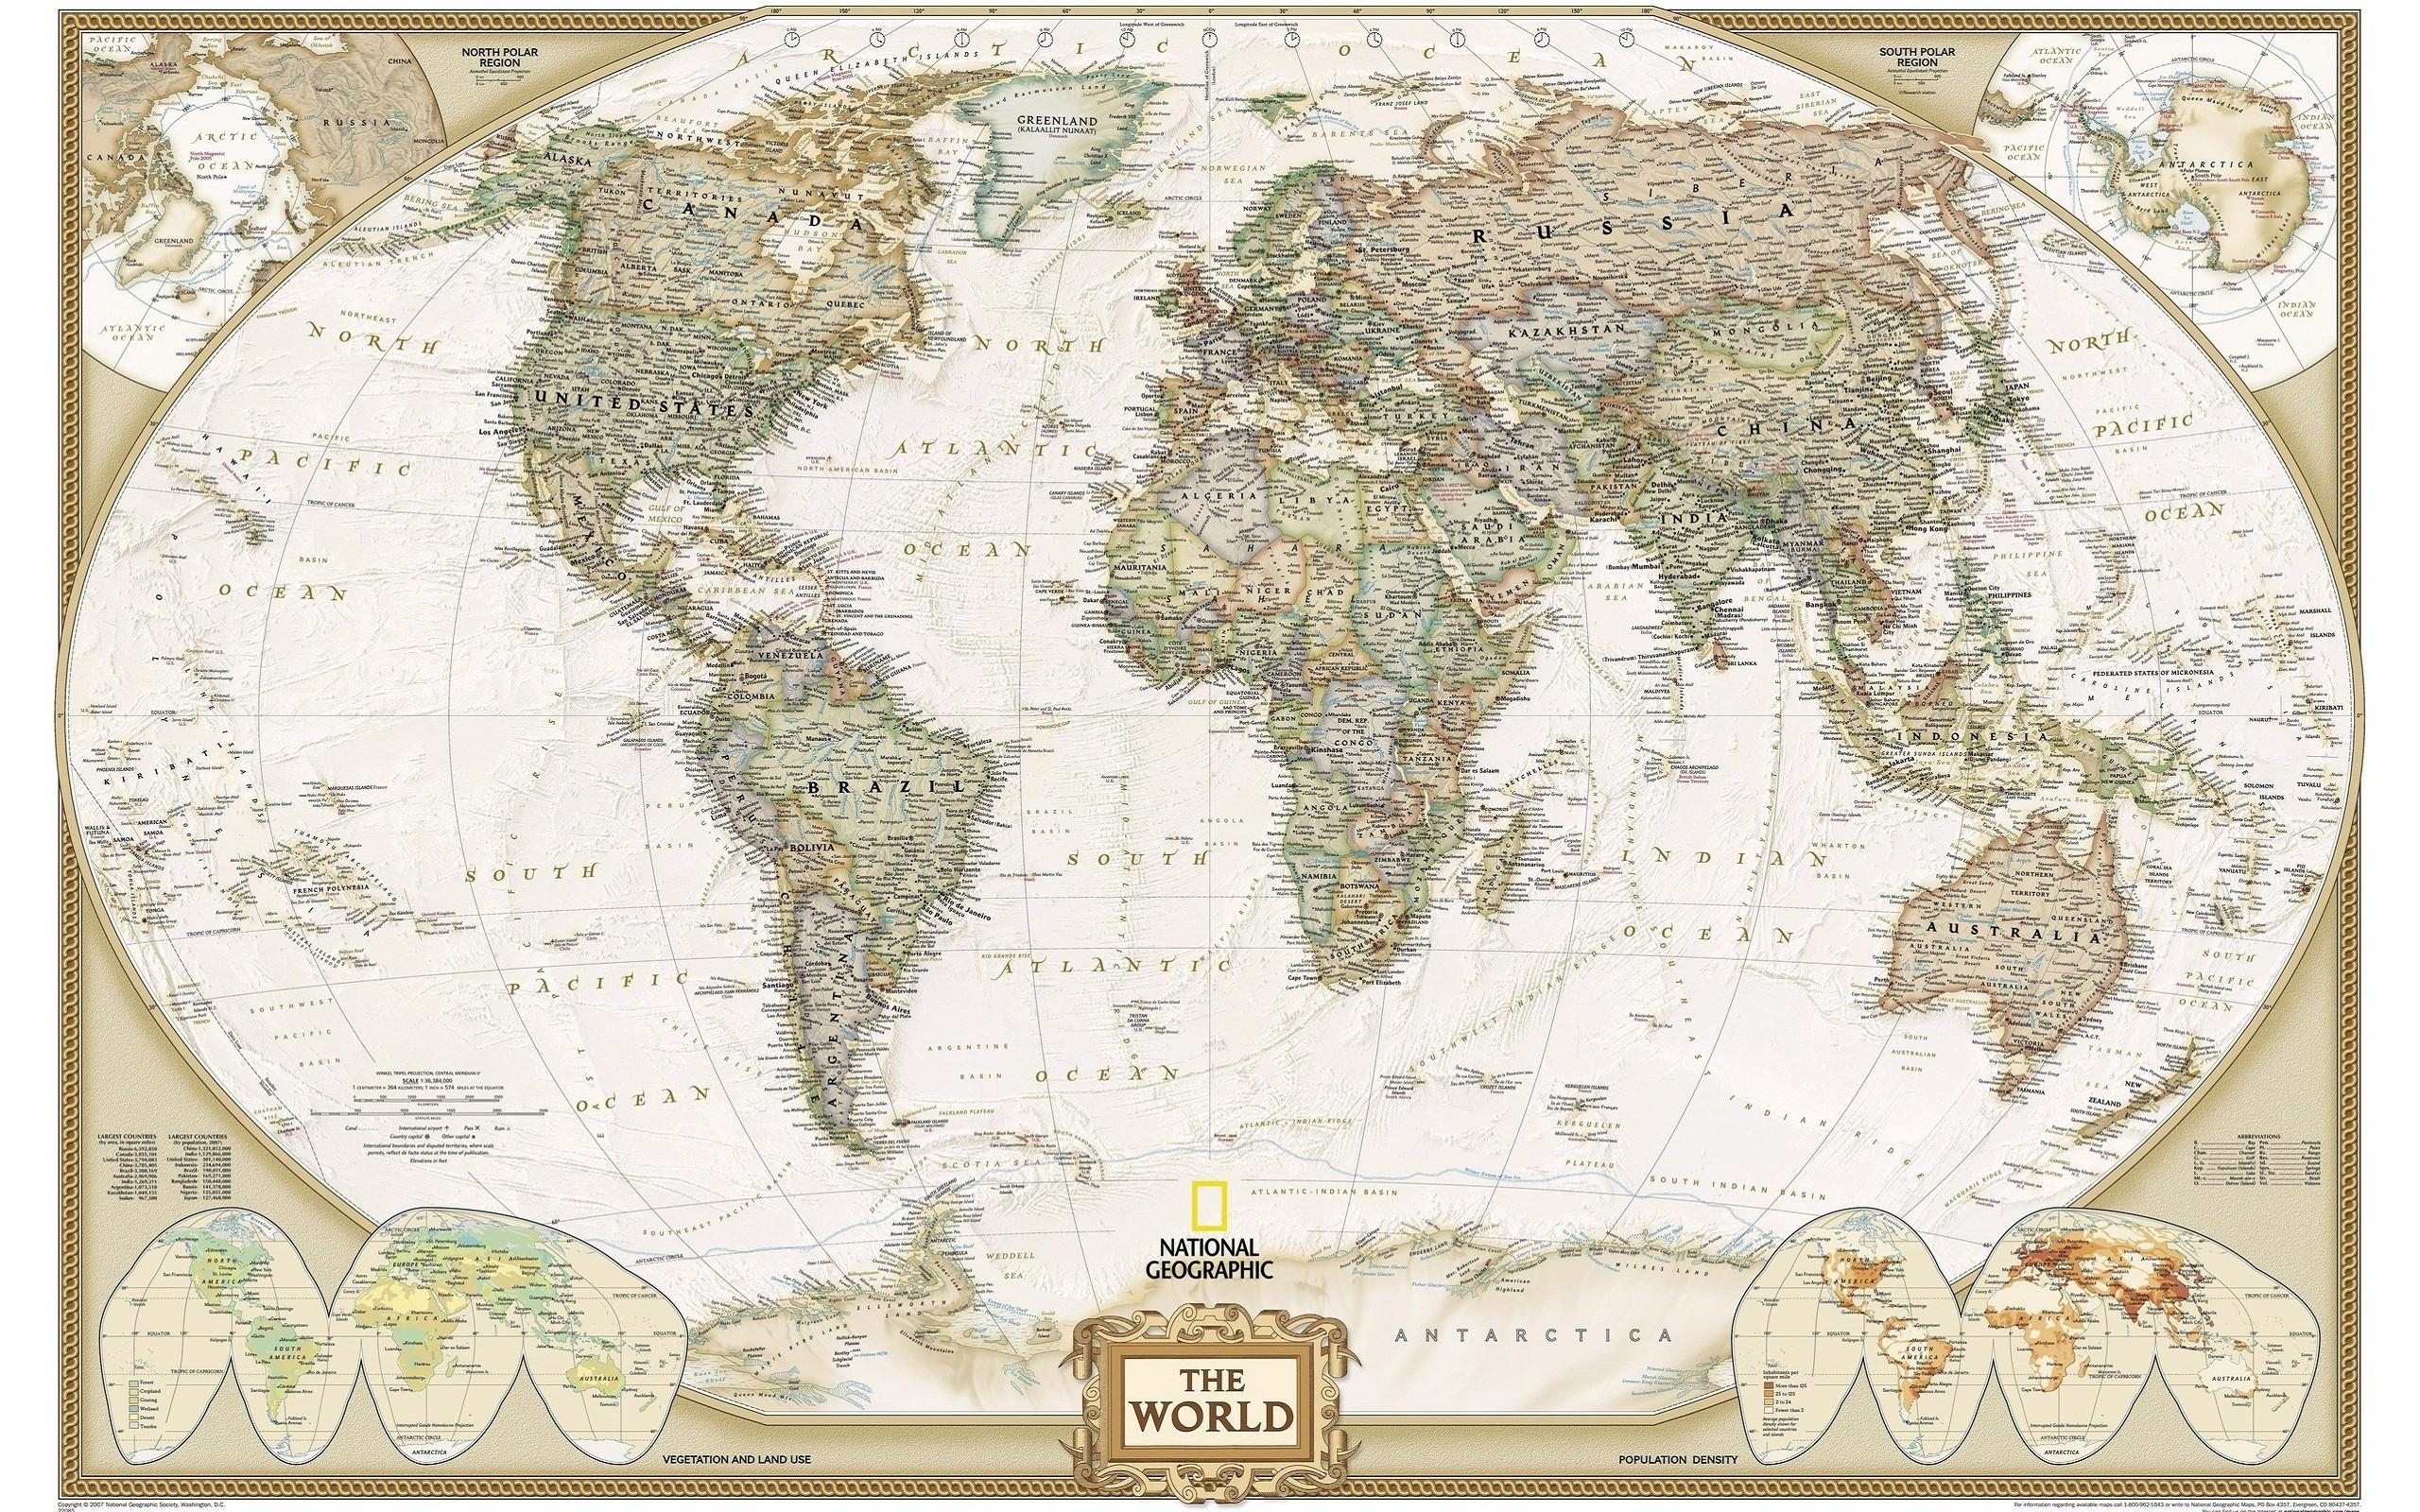 World map computer wallpaper 62 images 2560x1600 wallpaper download 2560x1600 world wallpaper gumiabroncs Gallery